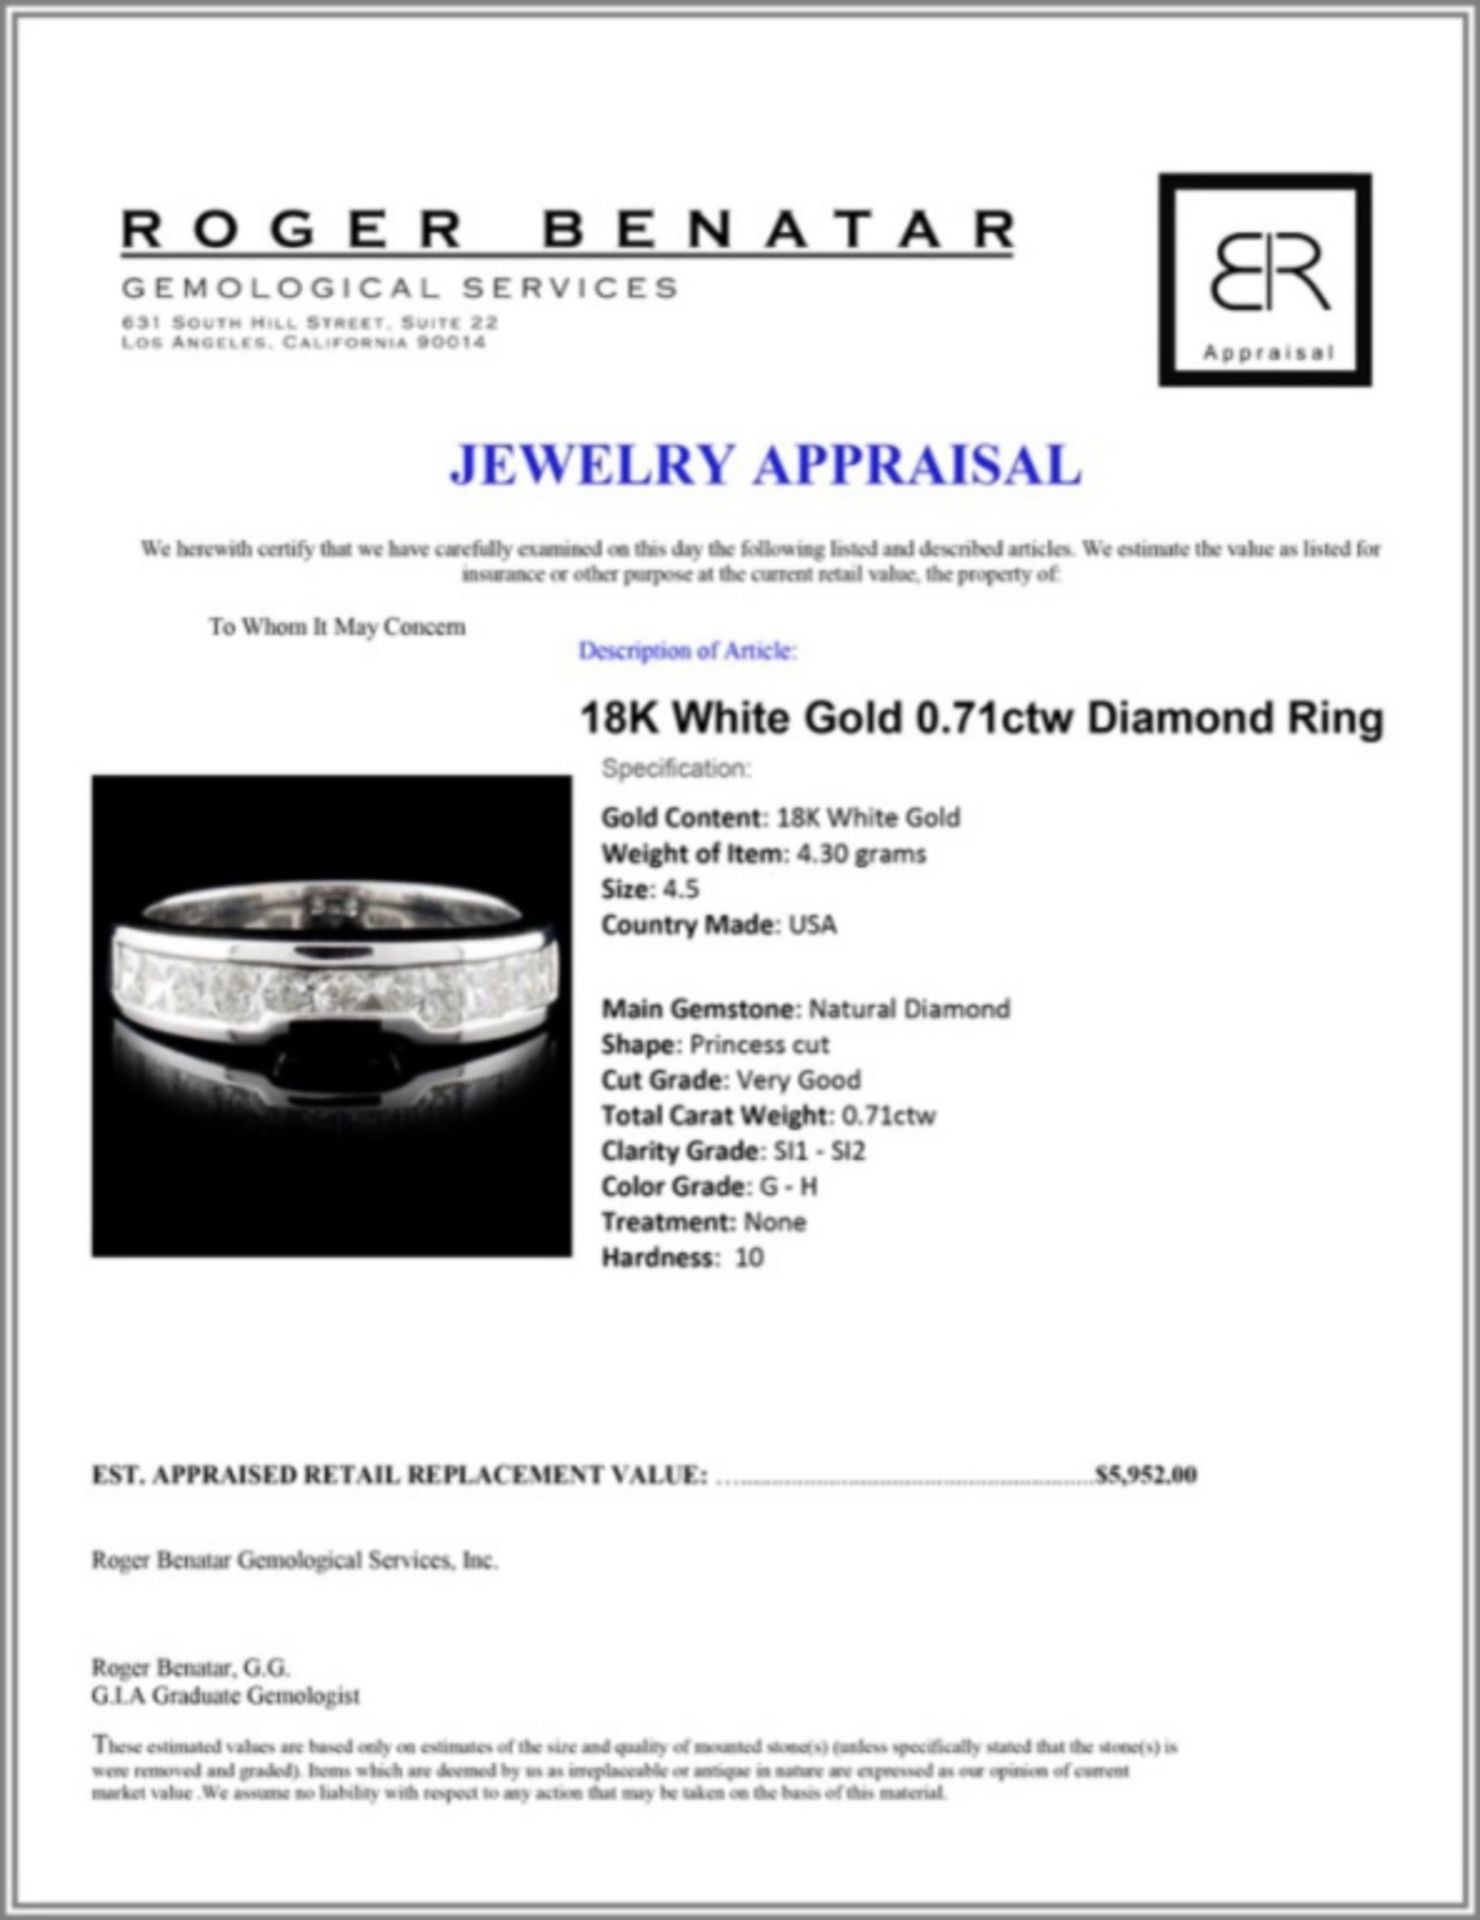 18K White Gold 0.71ctw Diamond Ring - Image 3 of 3